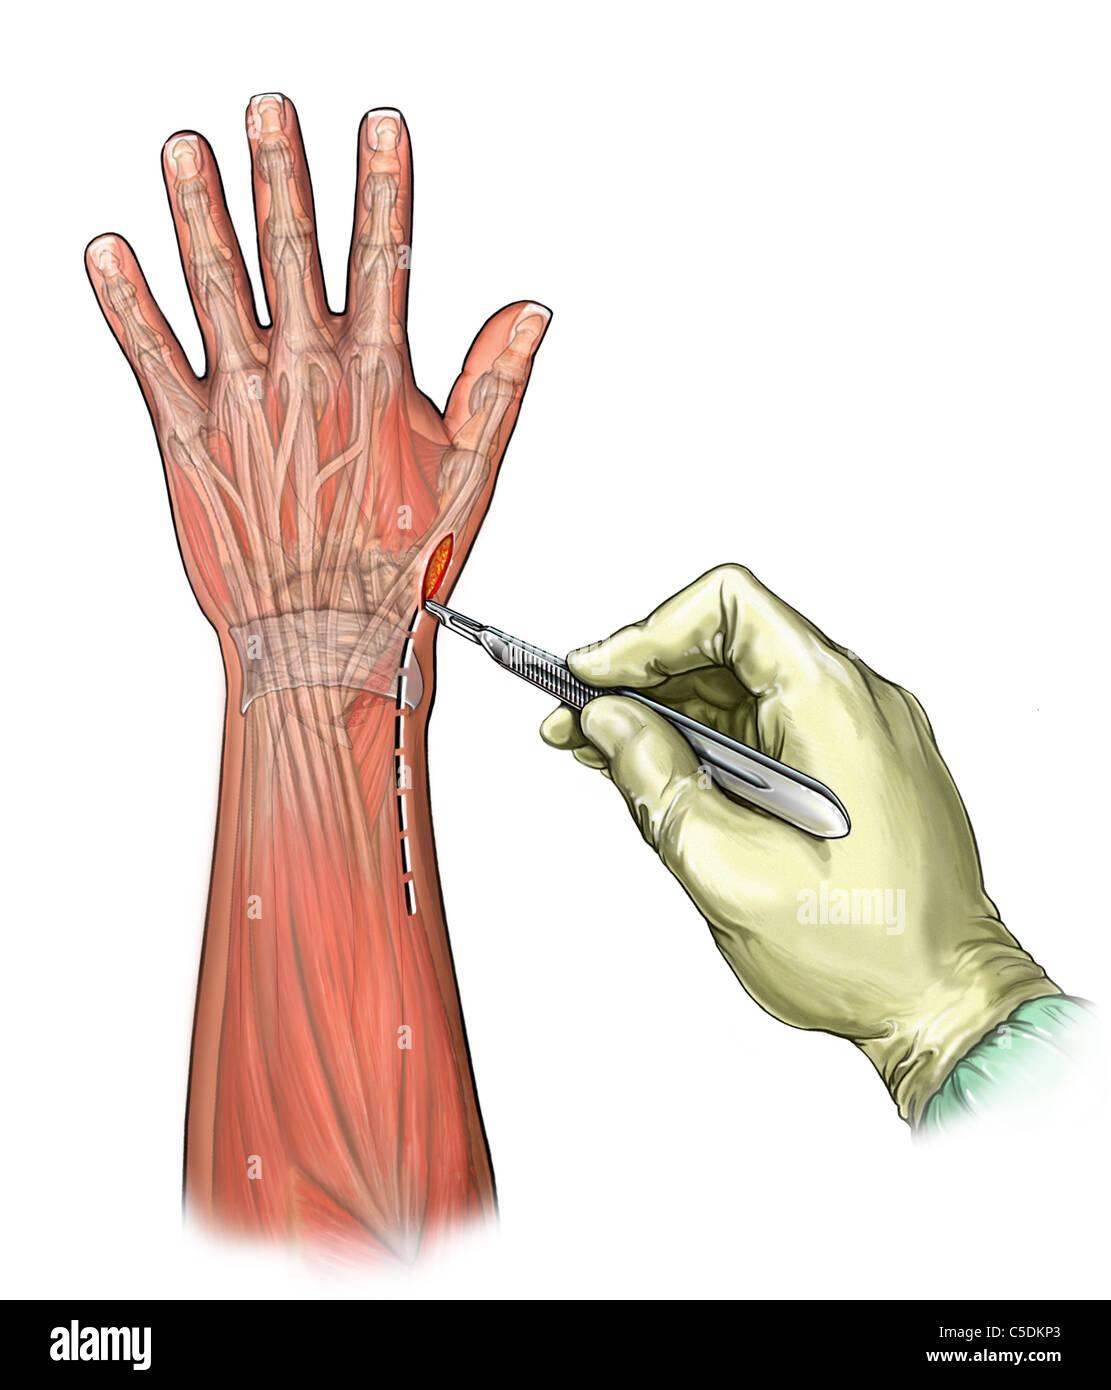 Dorsal Wrist Stock Photos & Dorsal Wrist Stock Images - Alamy